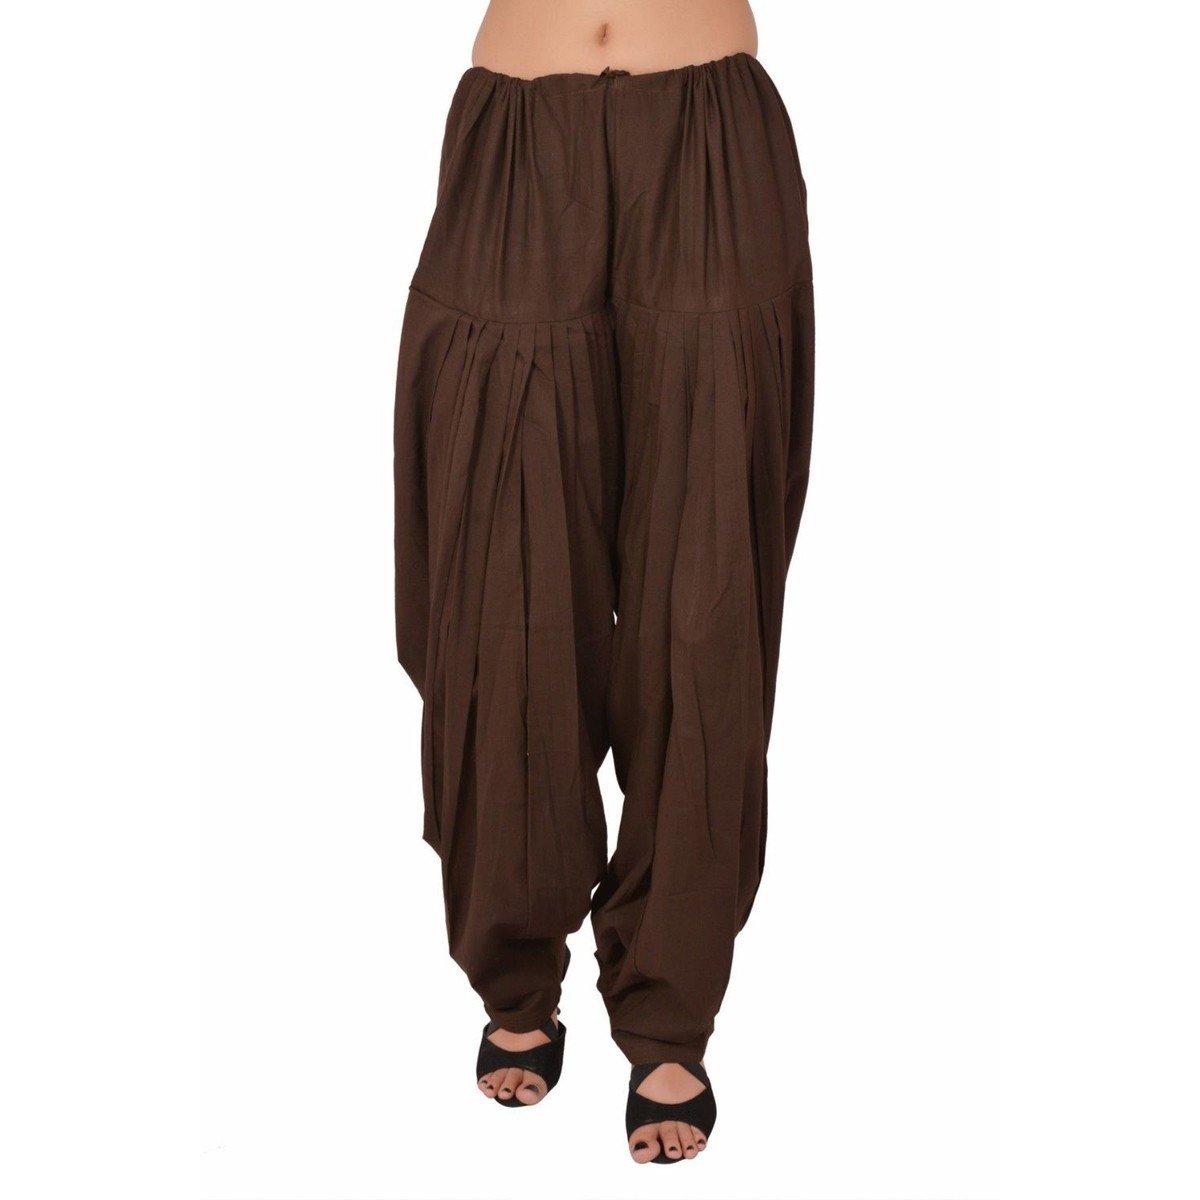 PlainPATIALASALWAR Pants-100% Cotton-IN MANY COLOURS- Kameez Kurti Tunic Yoga Patiala-A